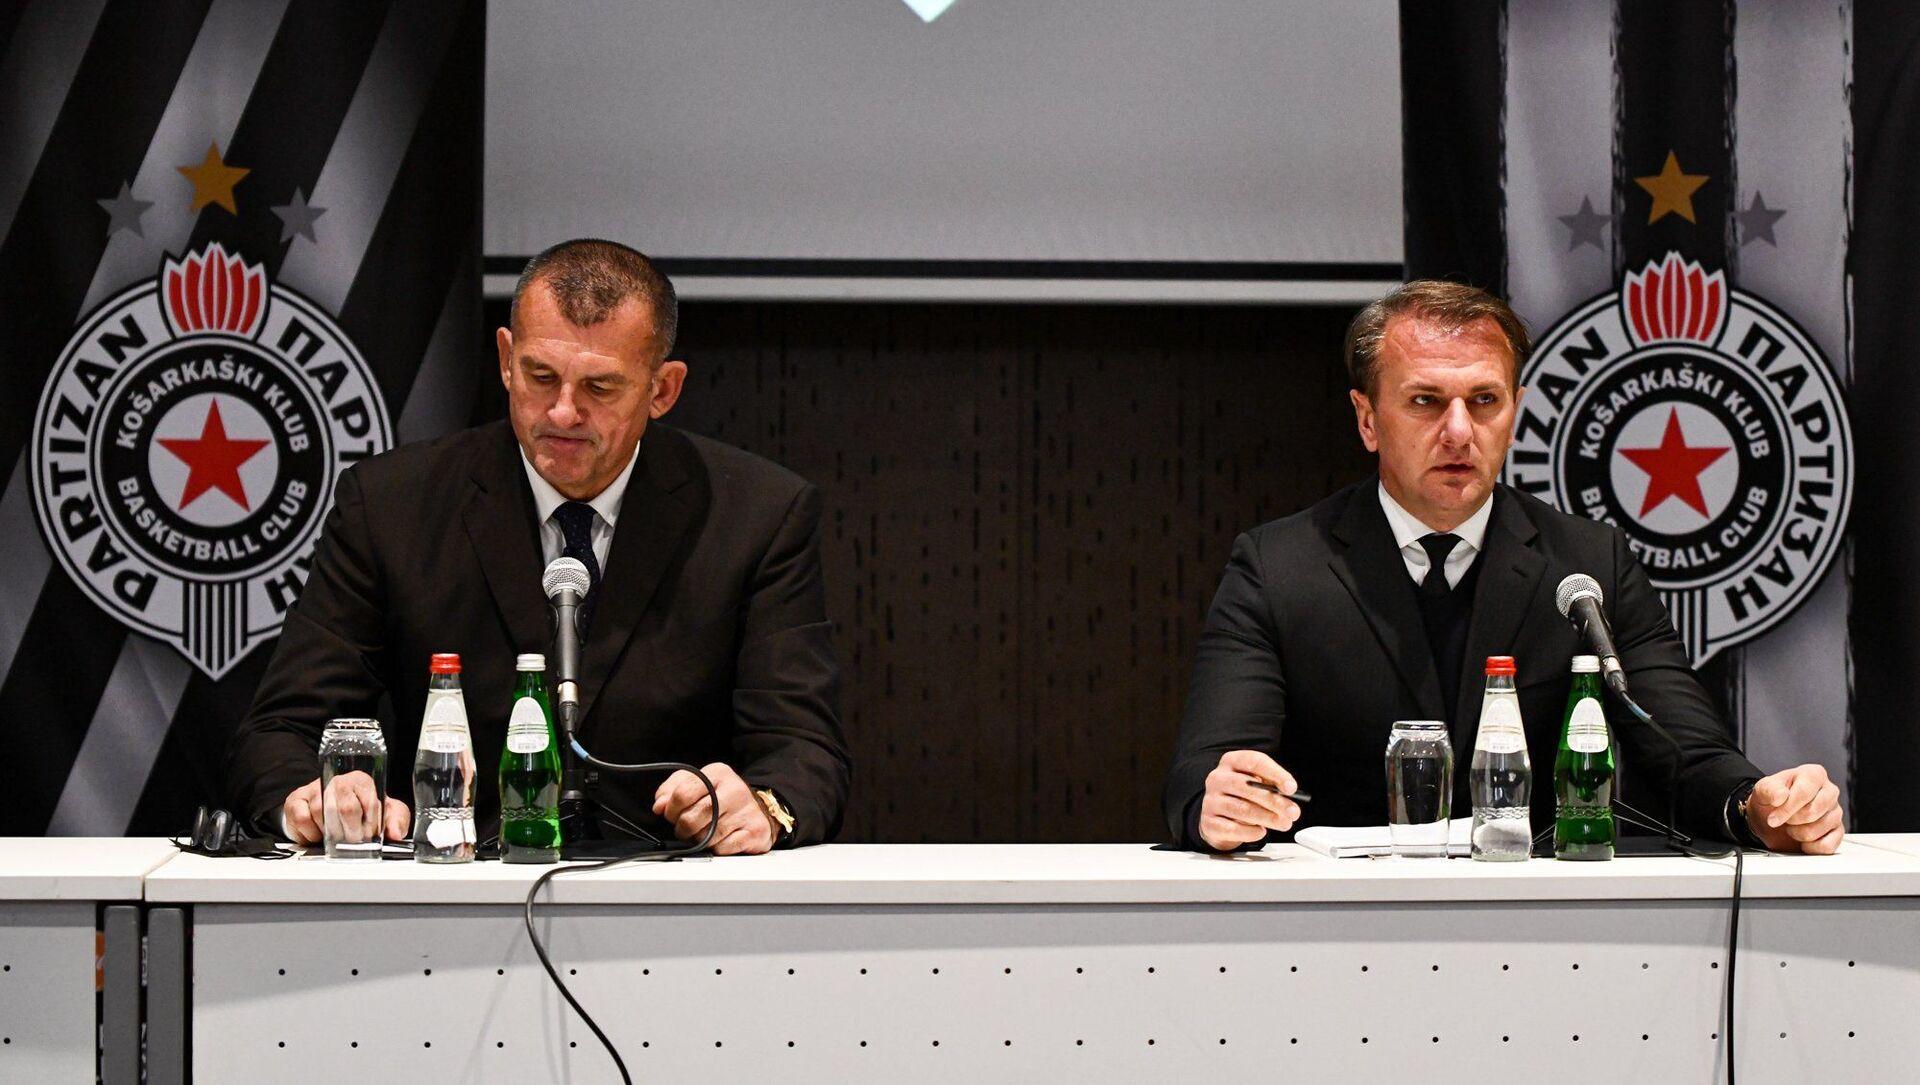 Зоран Савић, спортски директор Партизана, и Остоја Мијаиловић, председник Партизана - Sputnik Србија, 1920, 16.03.2021